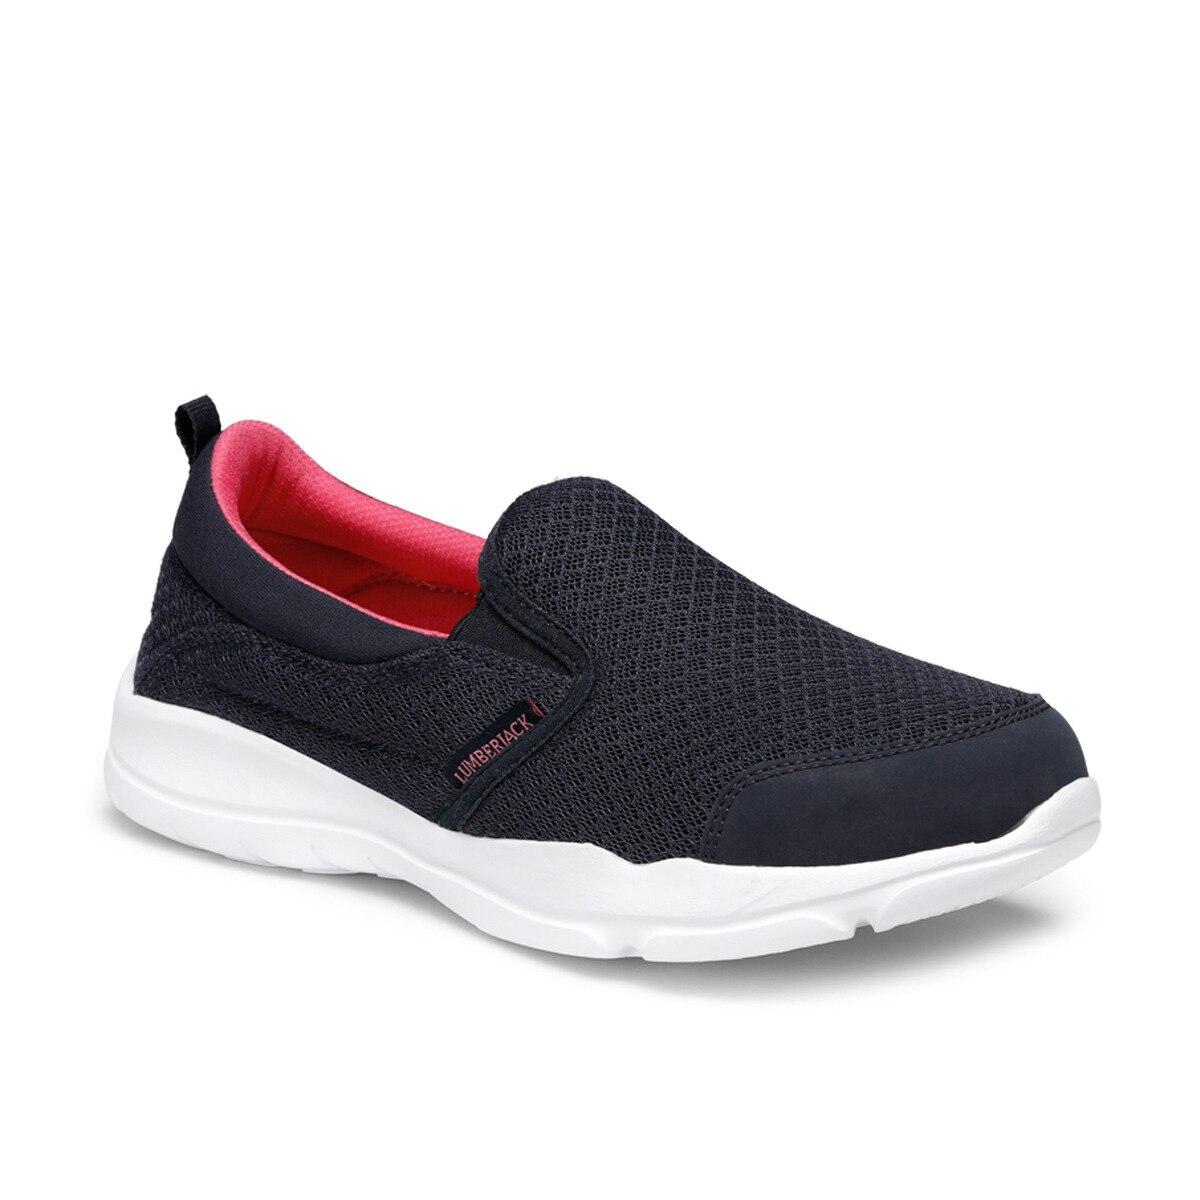 FLO Women Comfort Shoes Women Flat Slip On Shoes Woman Super Light Sneakers Summer Autumn Loafers Femme Shoes LUMBERJACK LIPONIS WMN